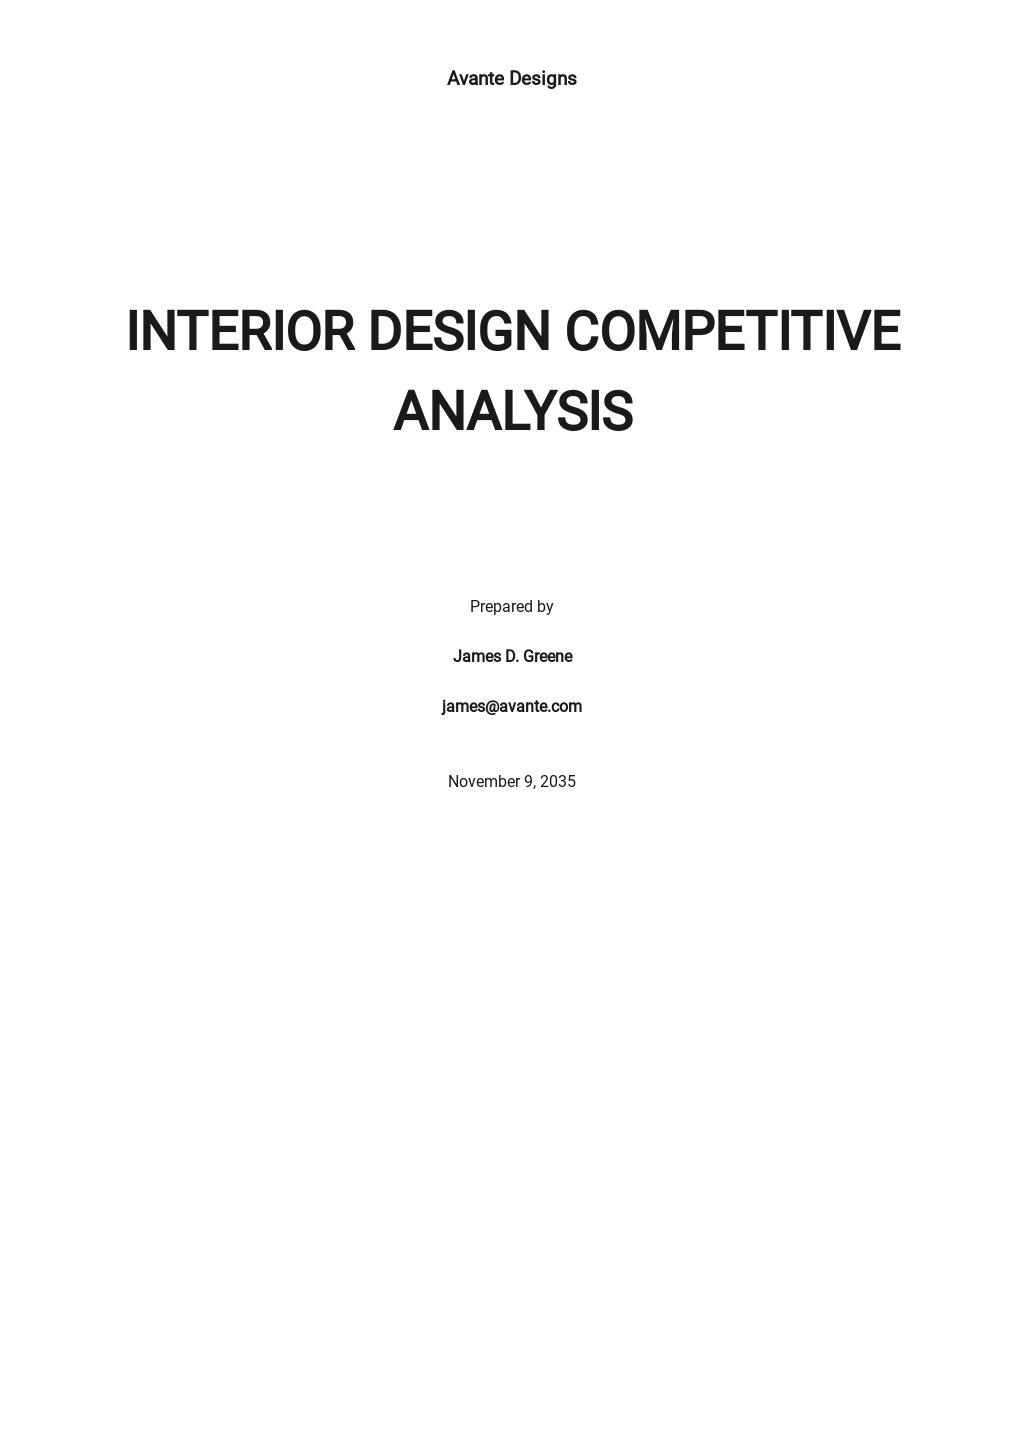 Interior Design Competitive Analysis Template